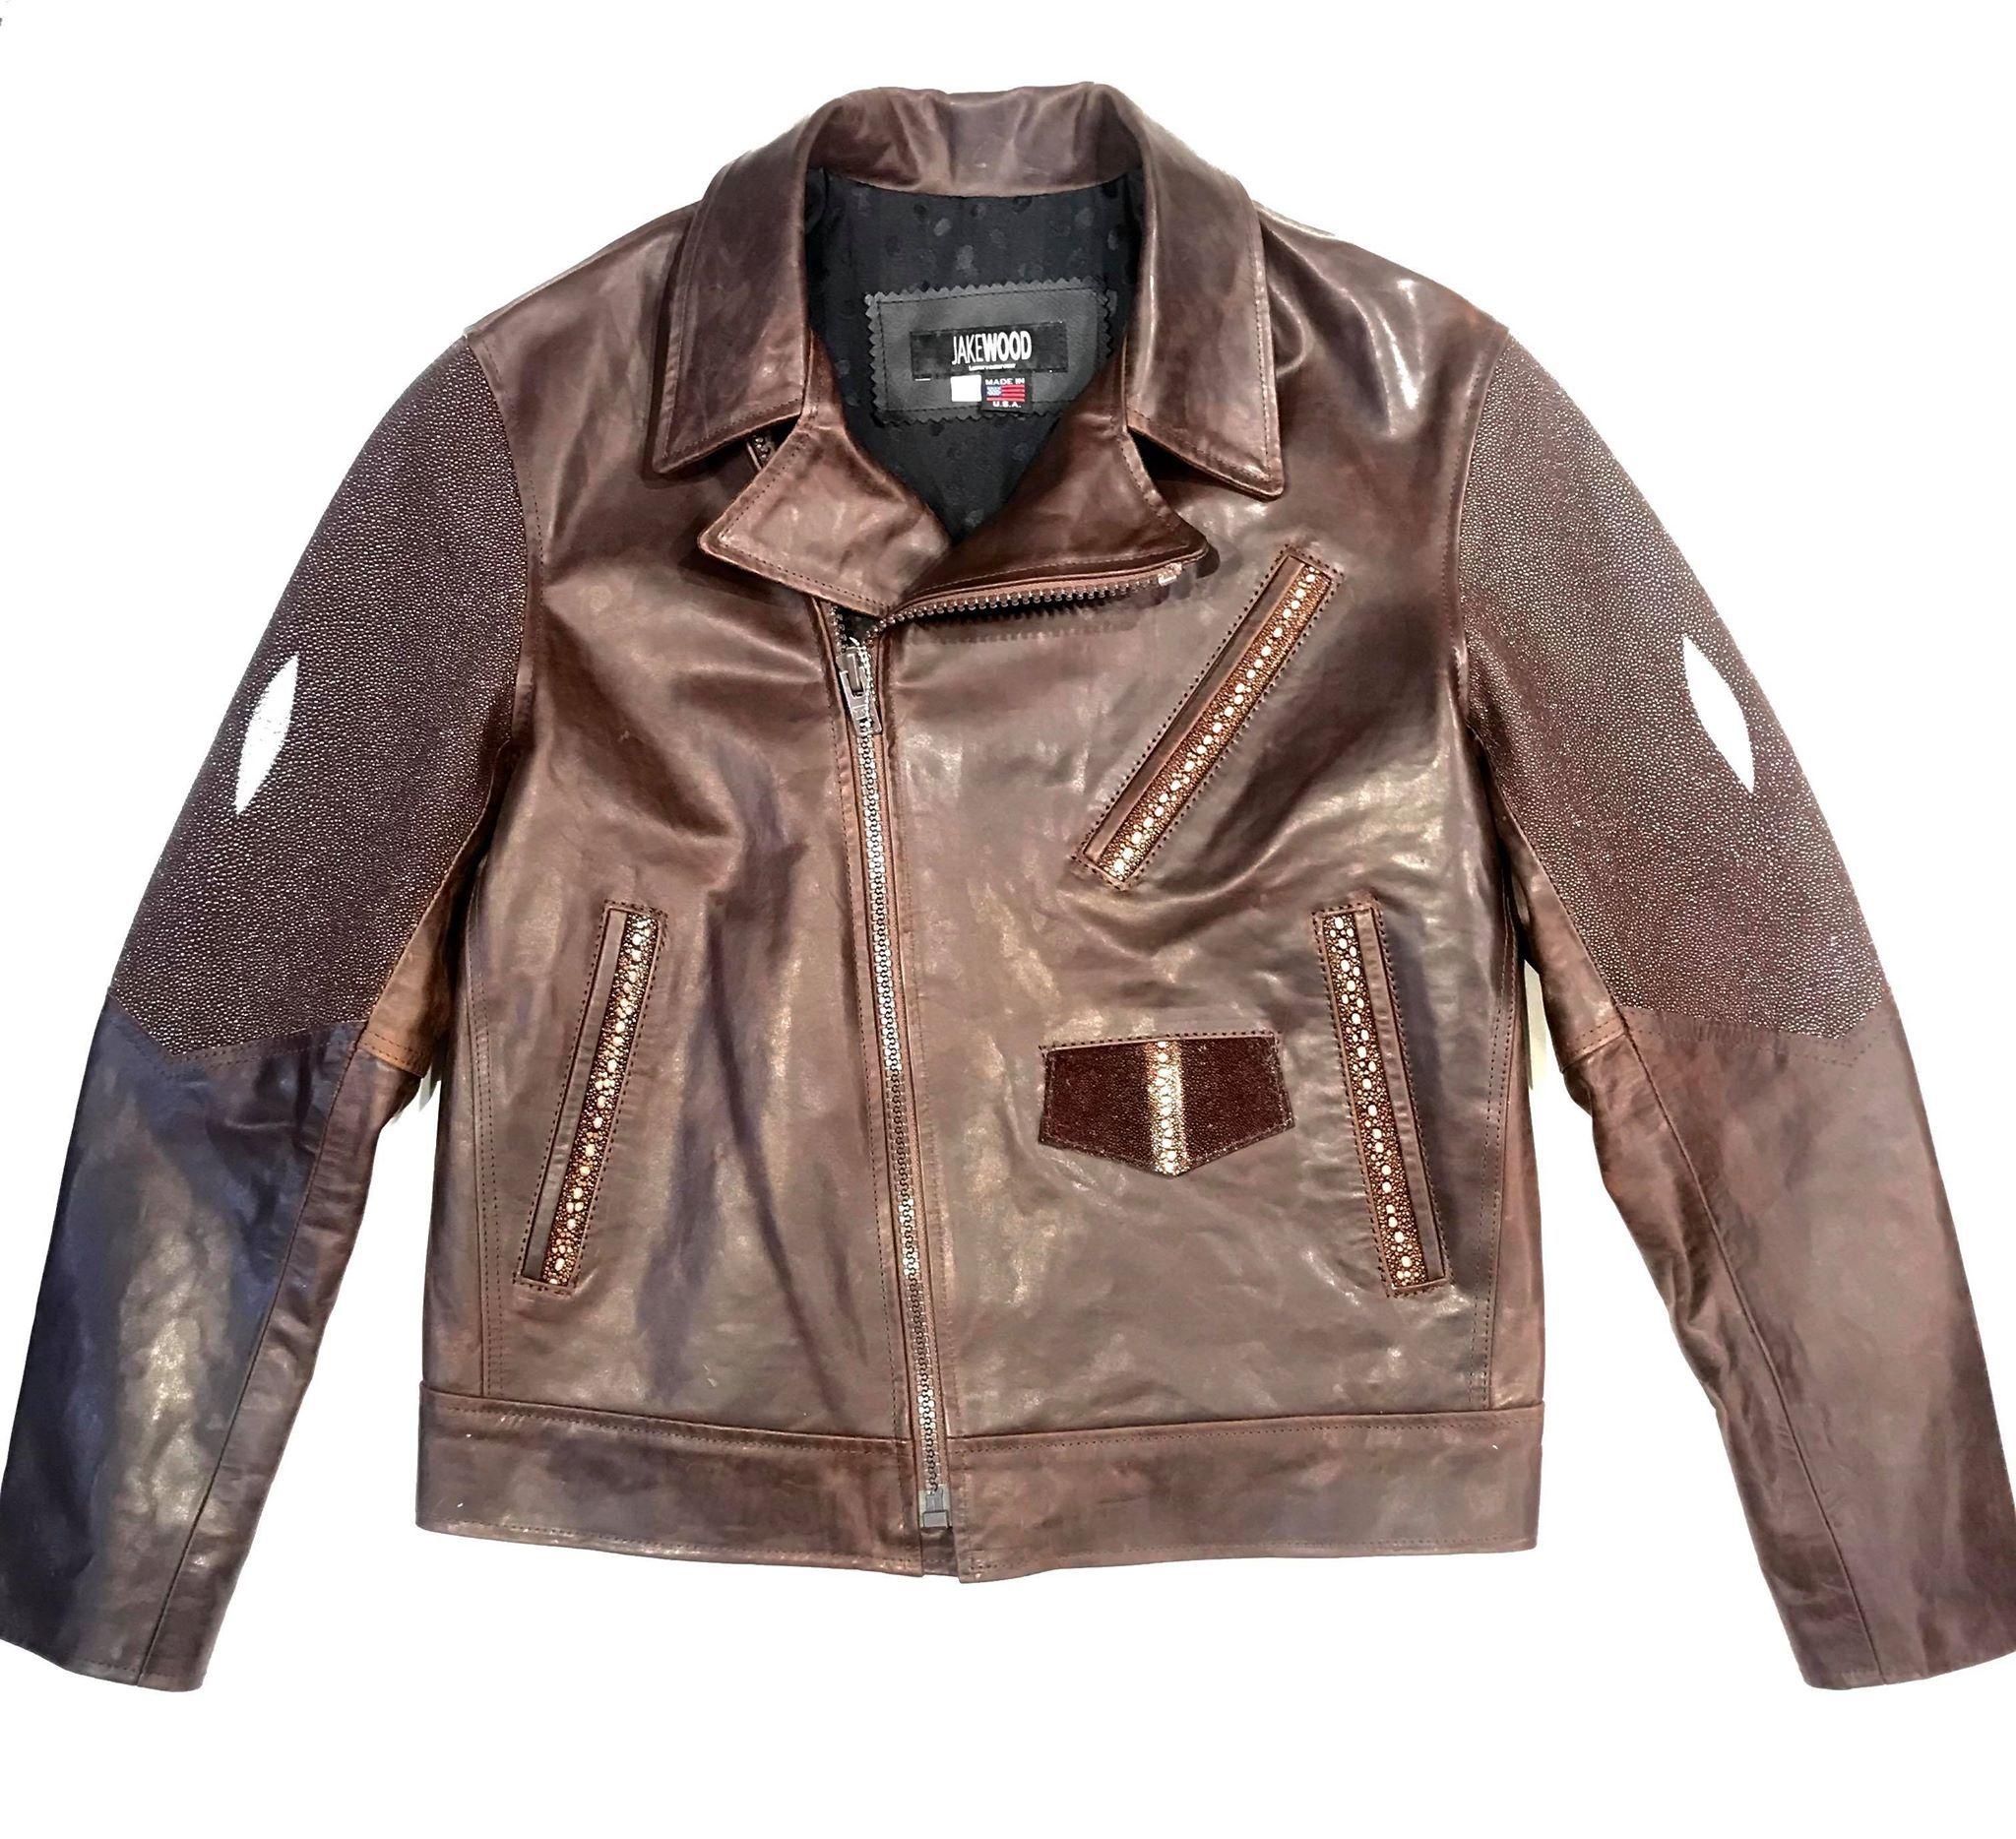 Kashani Chocolate Brown Stingray Leather Biker Jacket In 2021 Biker Jacket Leather Biker Jacket Stingray [ 1868 x 2048 Pixel ]